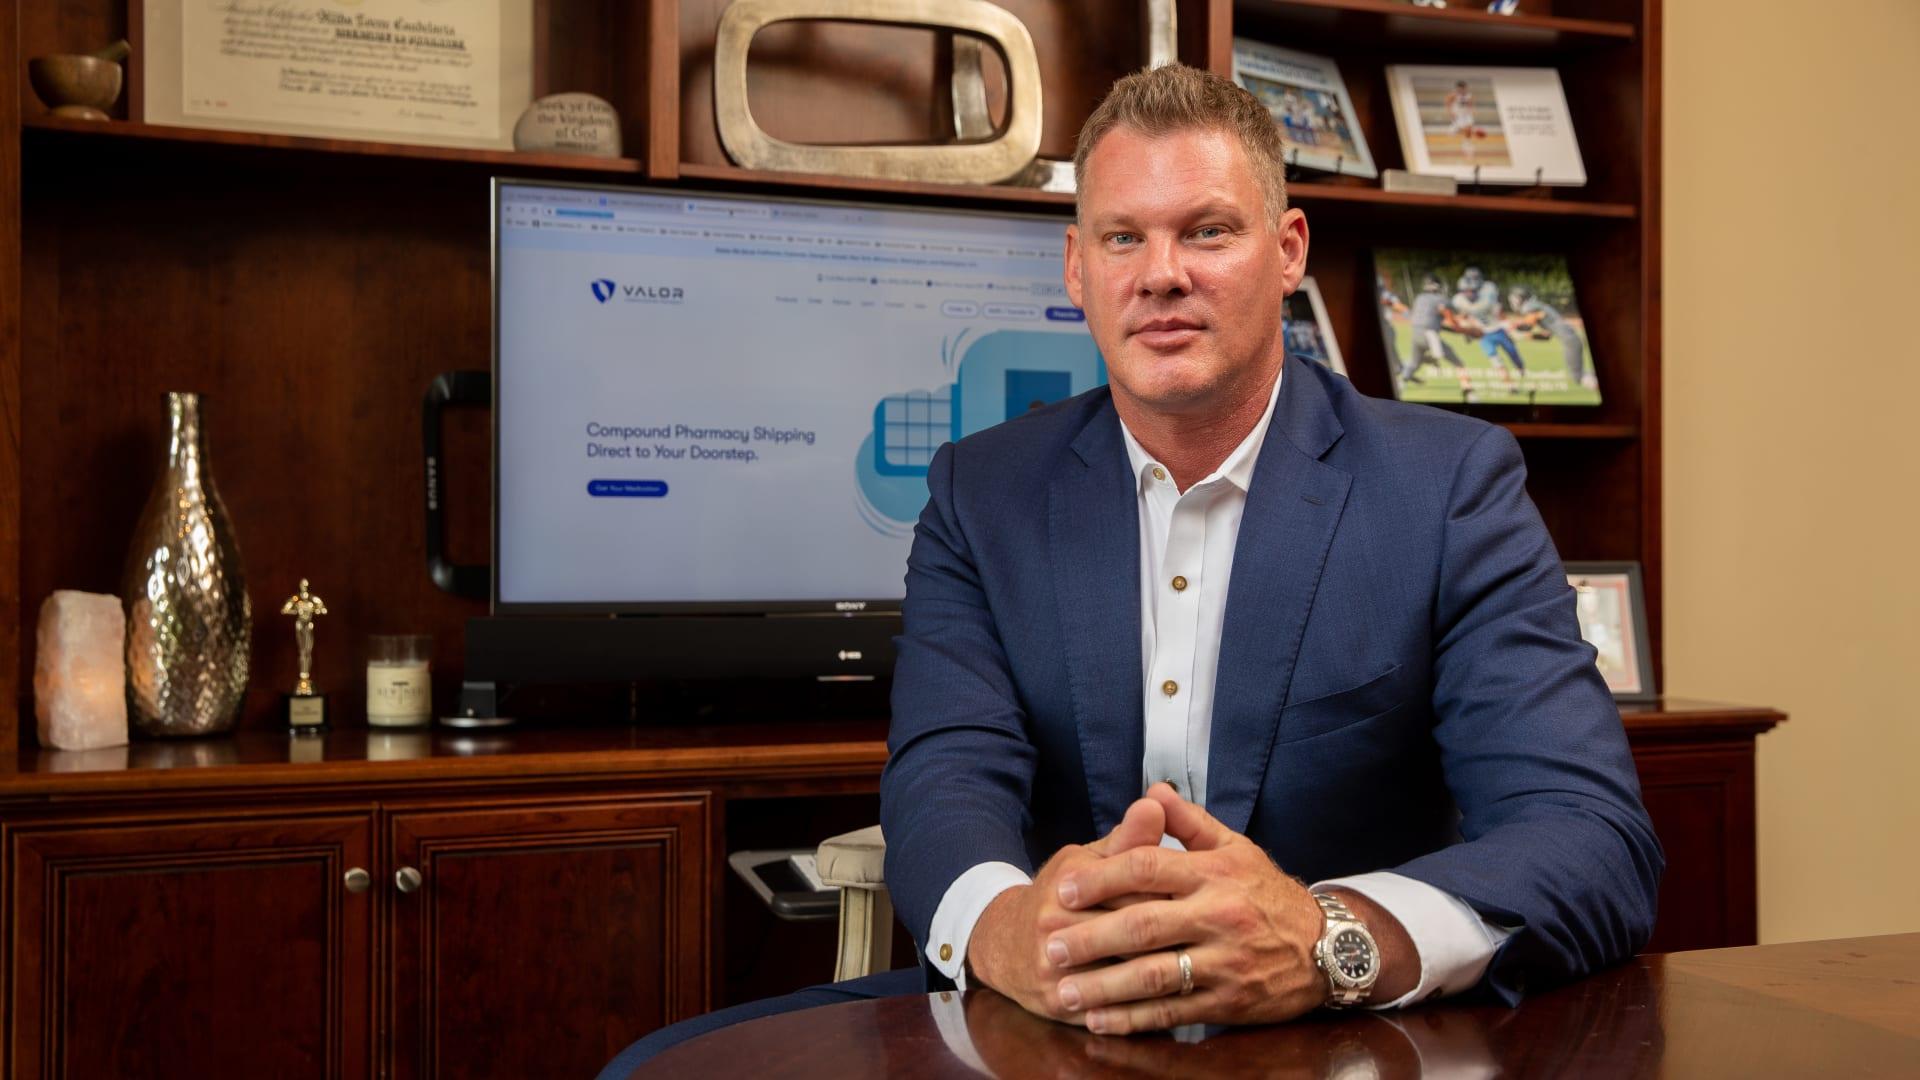 Rick Niemi, CEO of Valor Compounding Pharmacy